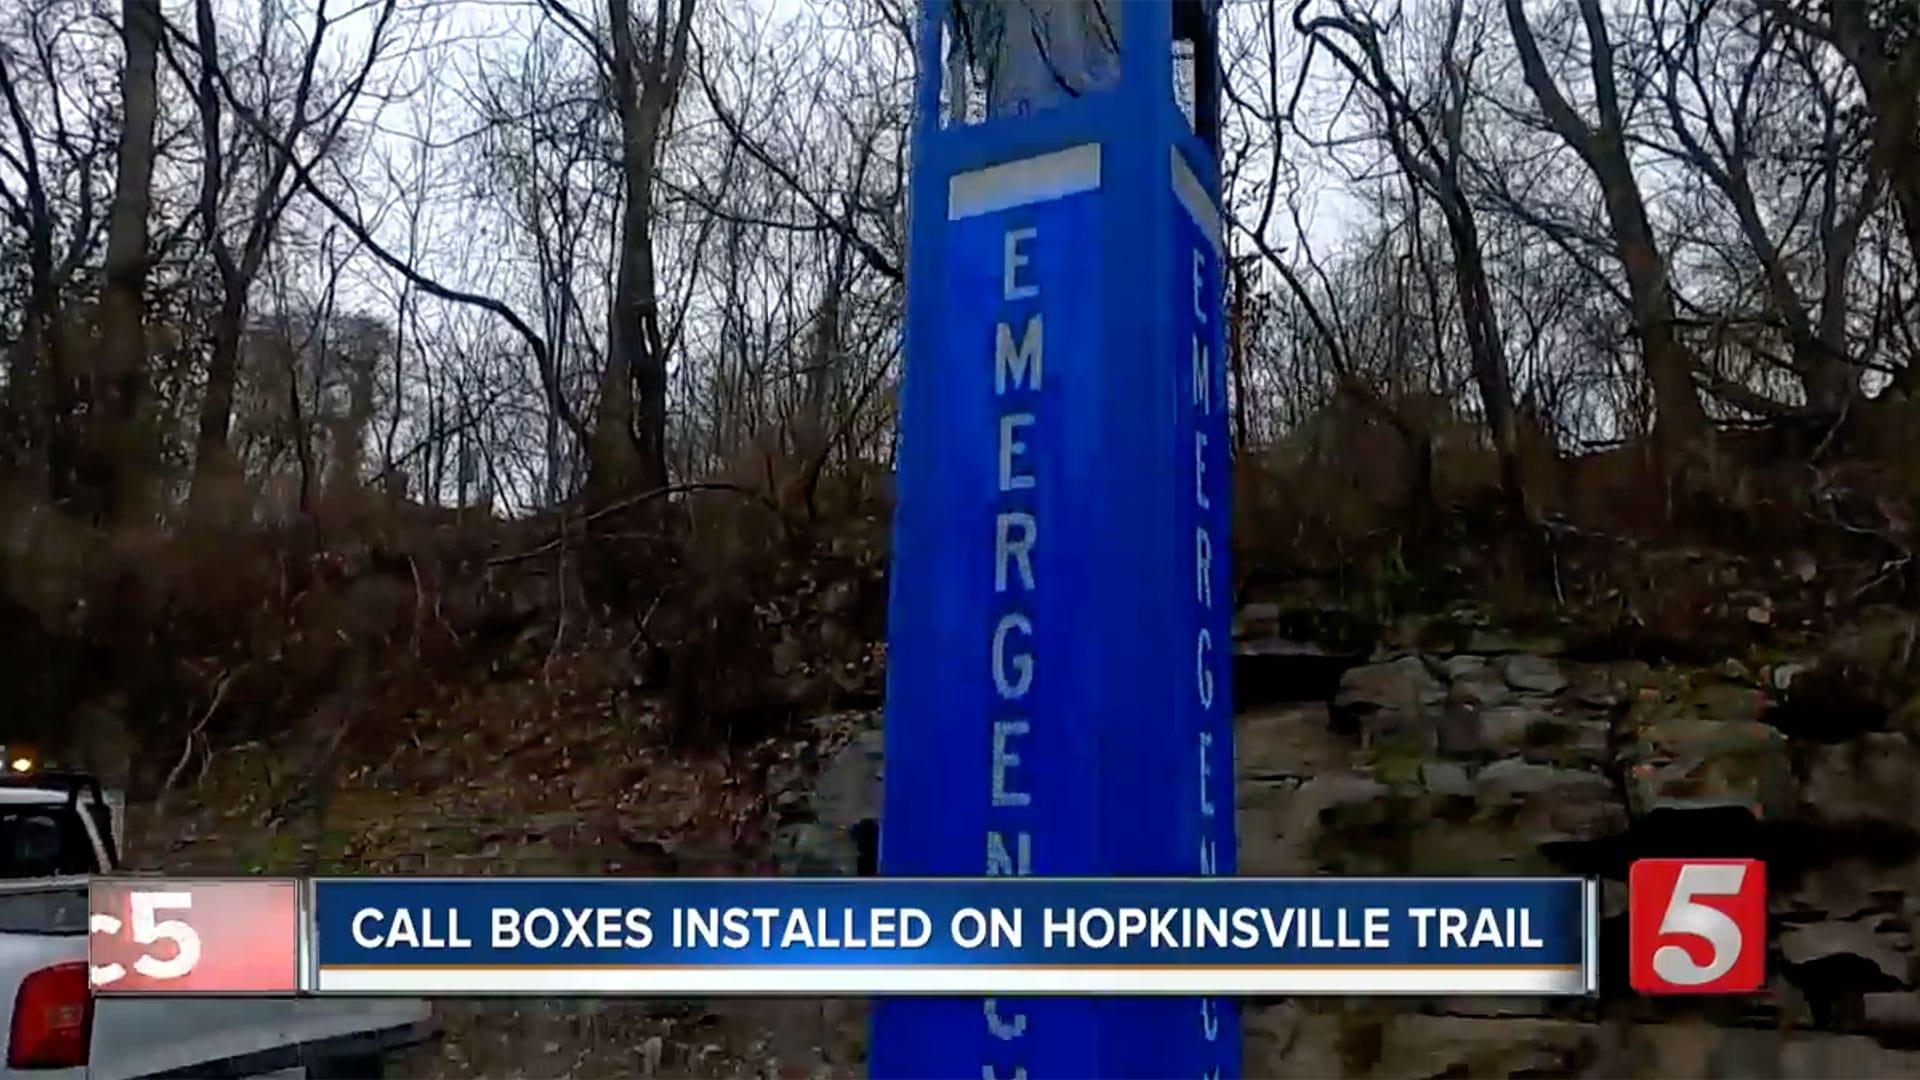 Hopkinsville-CASE-Installation-07-min